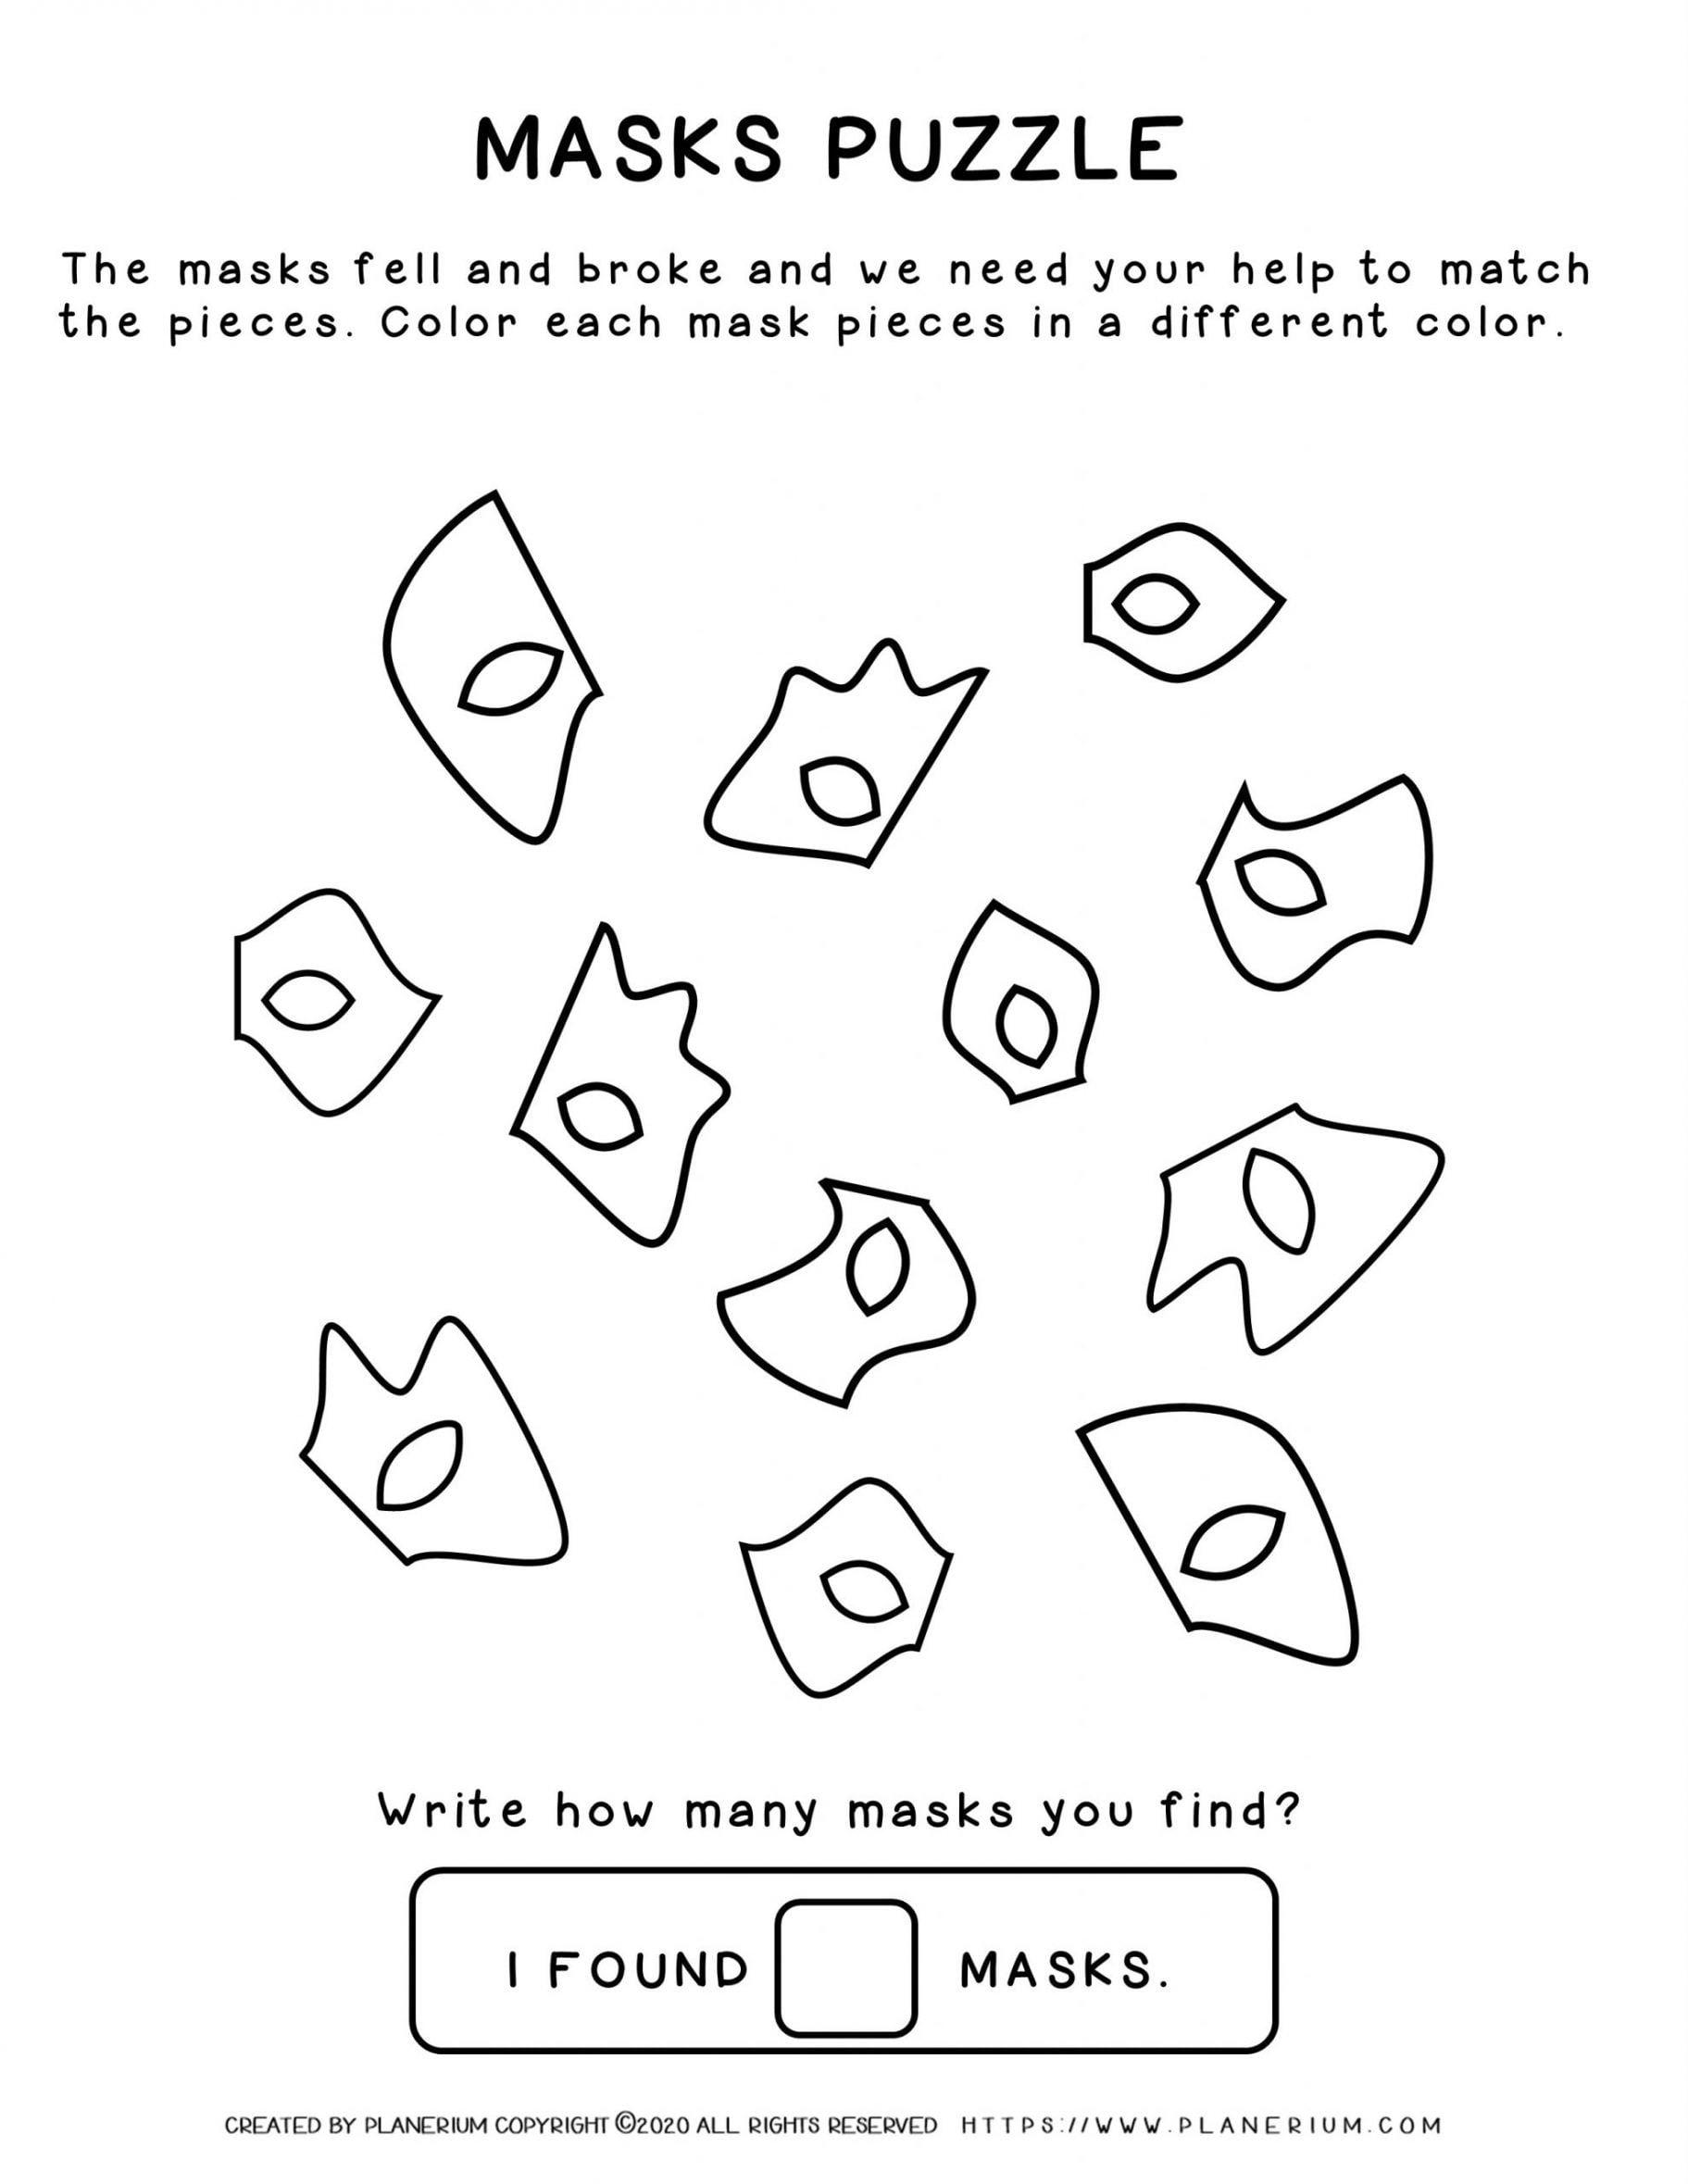 Carnival - Coloring Pages Worksheets - Masks Puzzle   Planerium